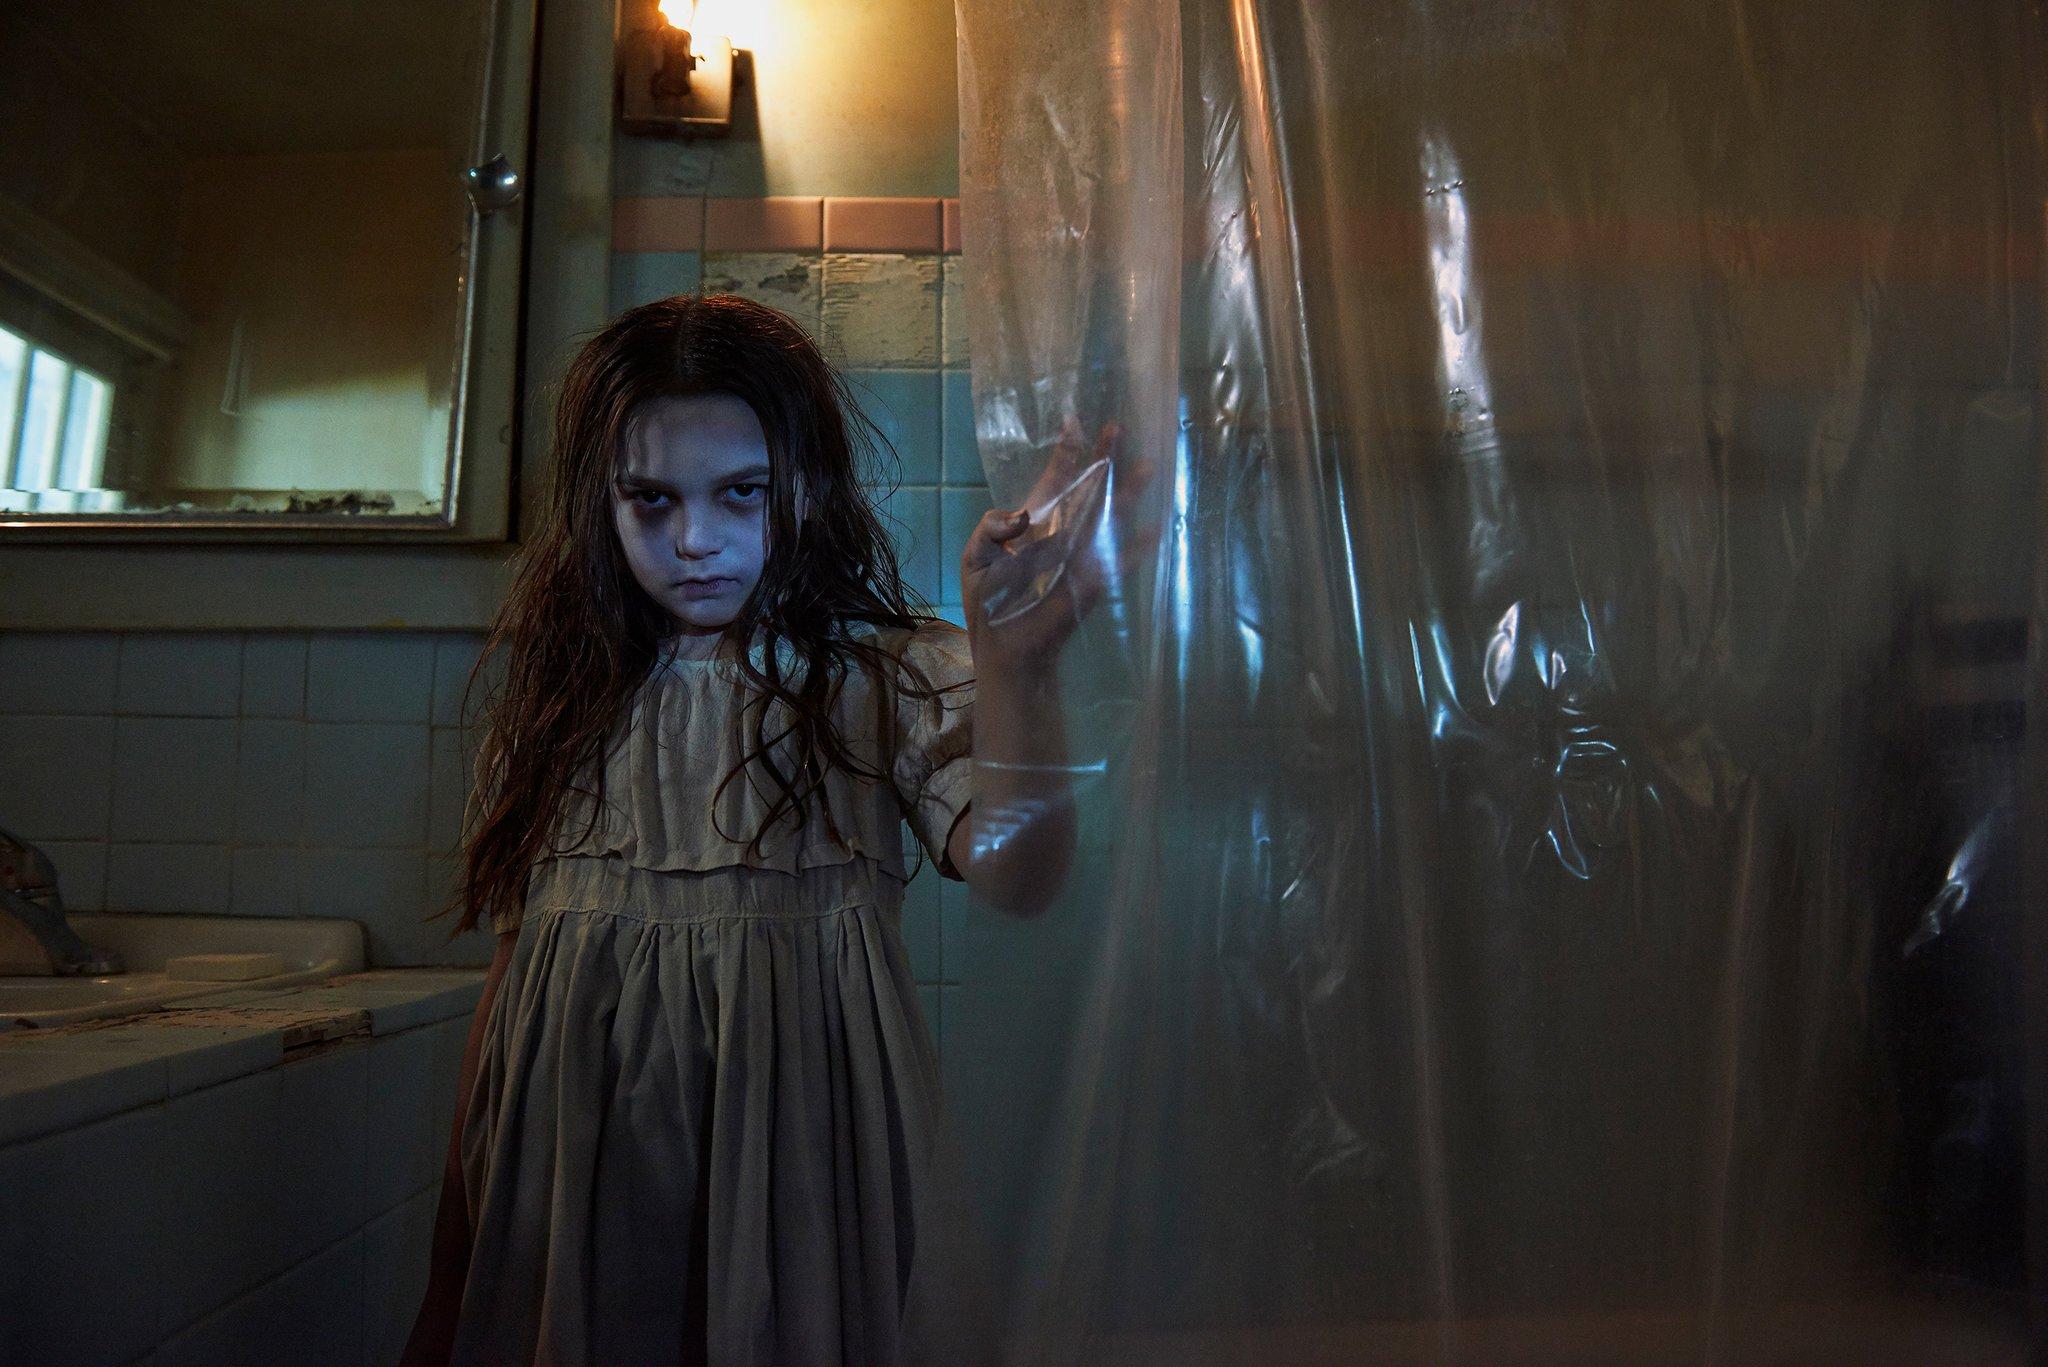 Голливудские звезды снялись в хоррор-проекте The New York Times-Фото 9